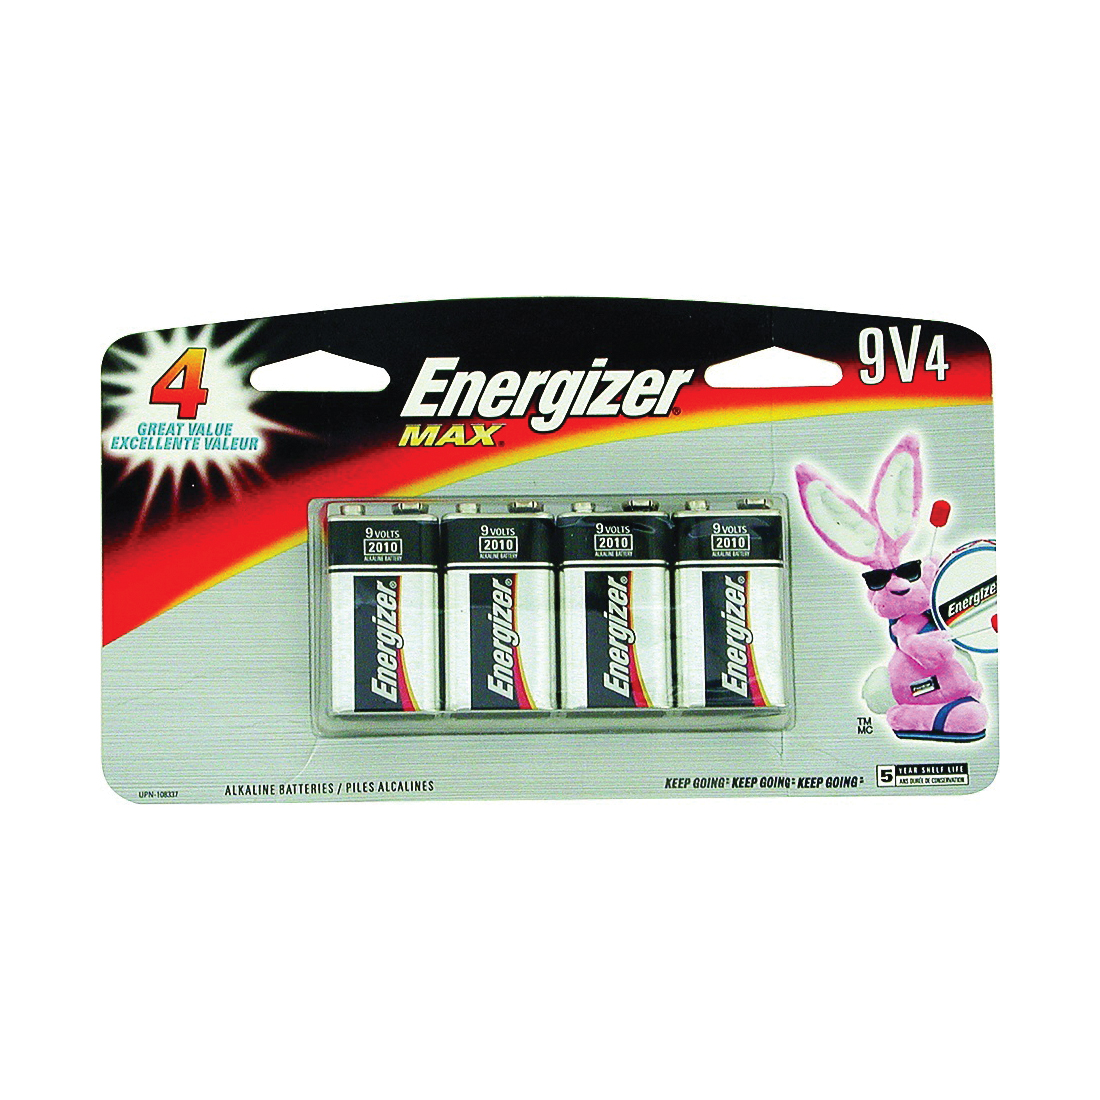 Picture of Energizer 522BP-4H Alkaline Battery, 9 V Battery, 625 mAh, 9 V Battery, Zinc, Manganese Dioxide, 4/PK